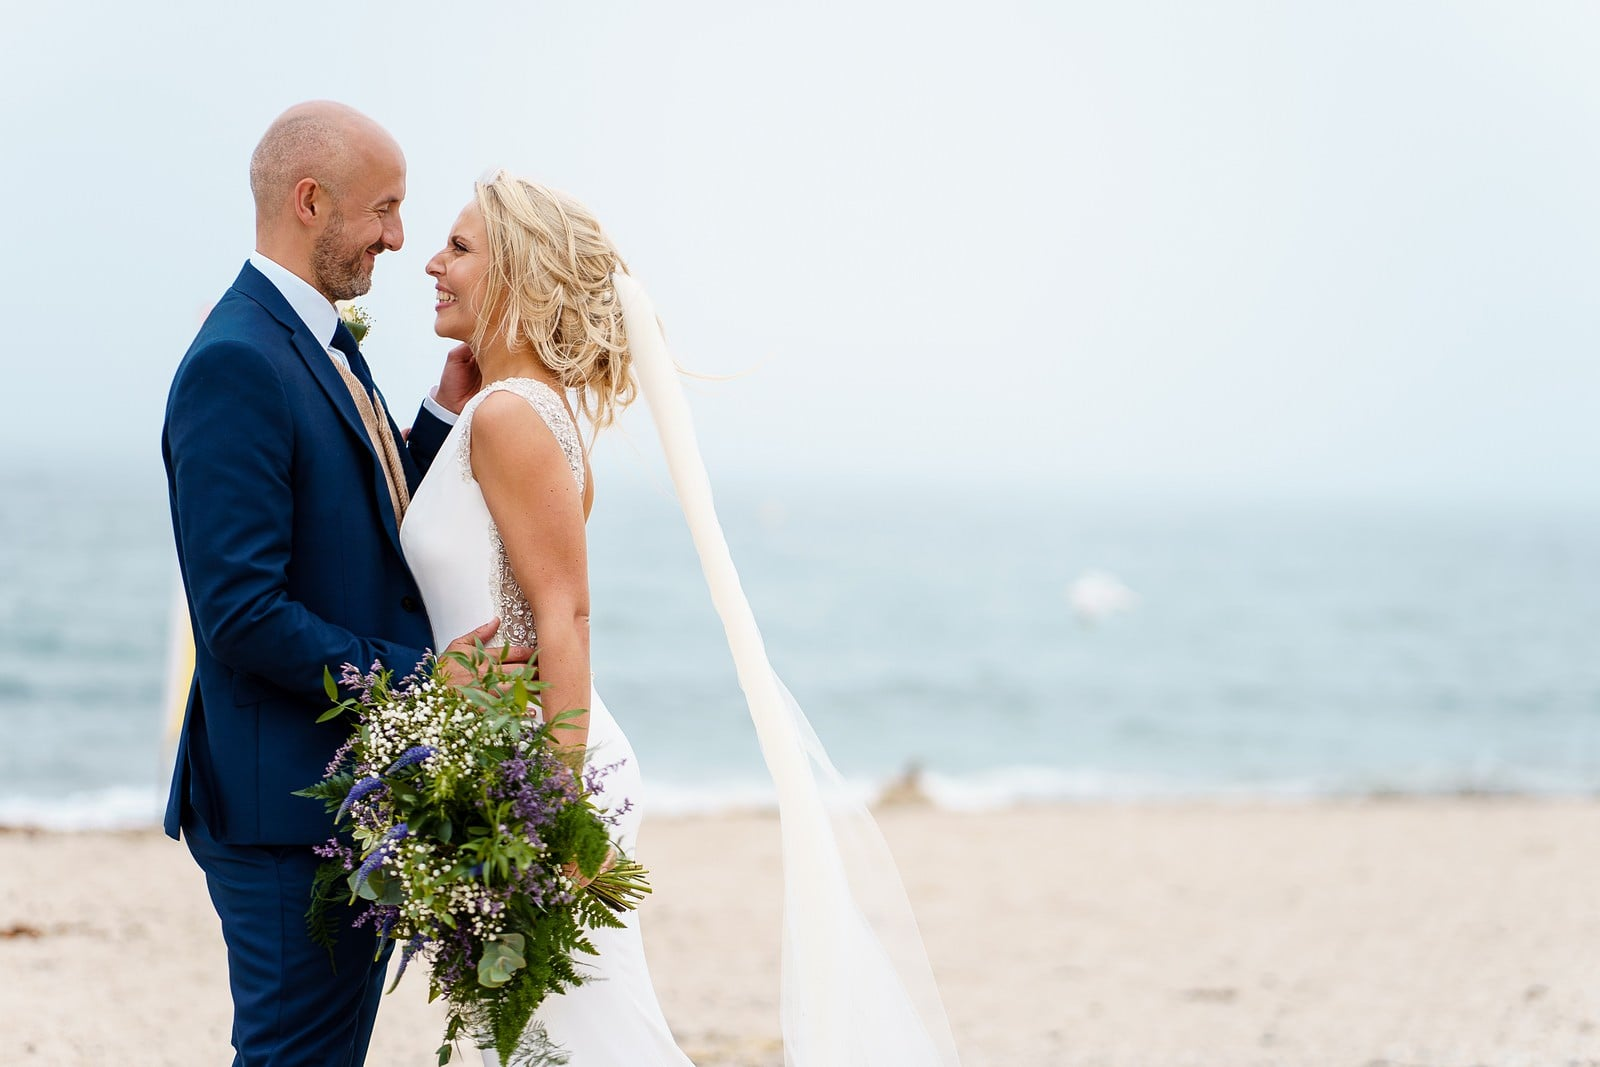 Greenbank hotel wedding photographer 7